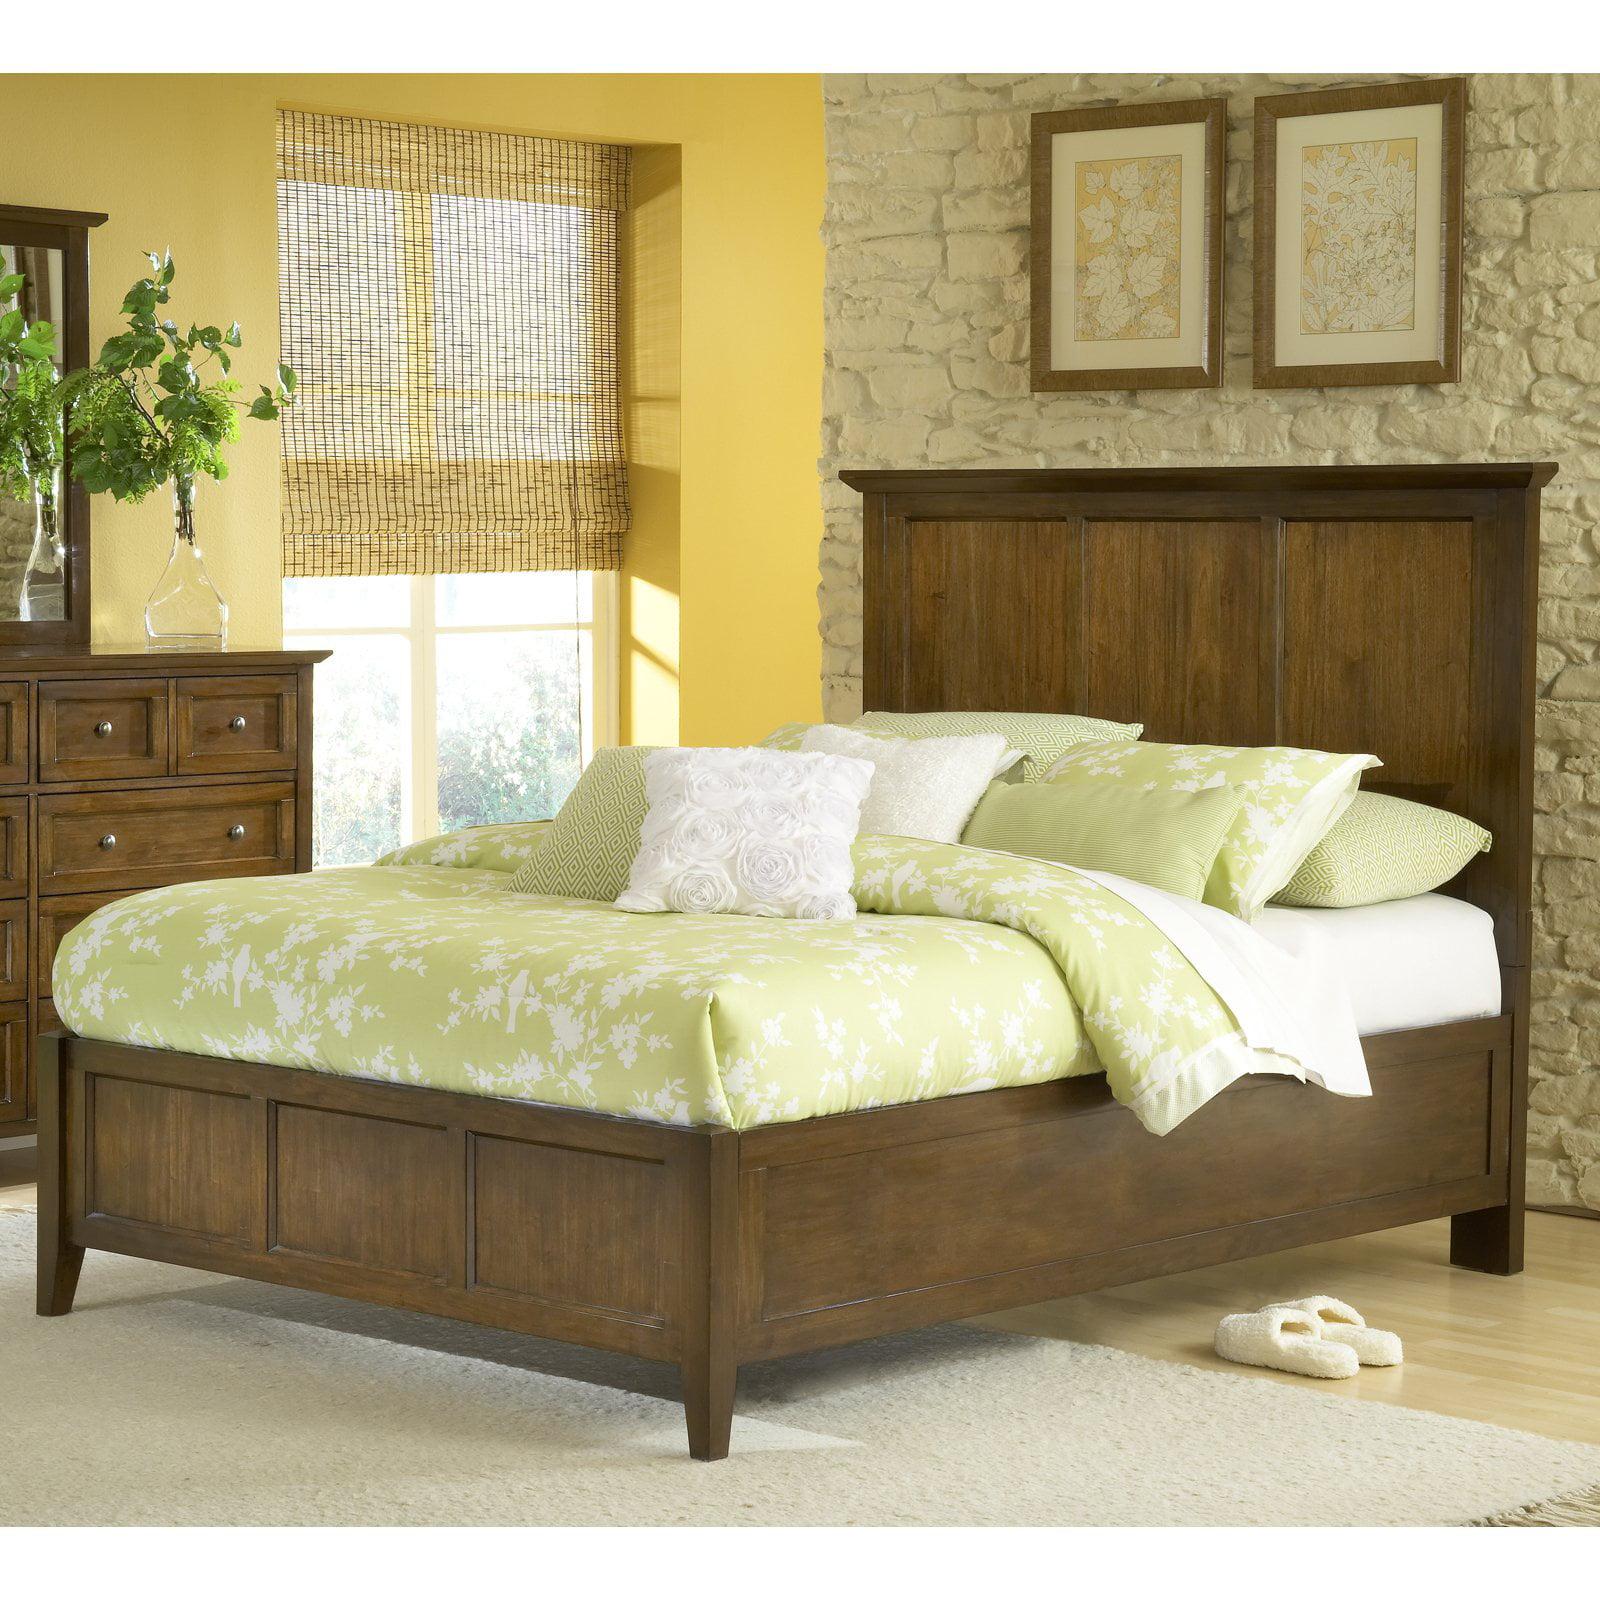 Modus Paragon Panel Storage Bed by Modus Furniture